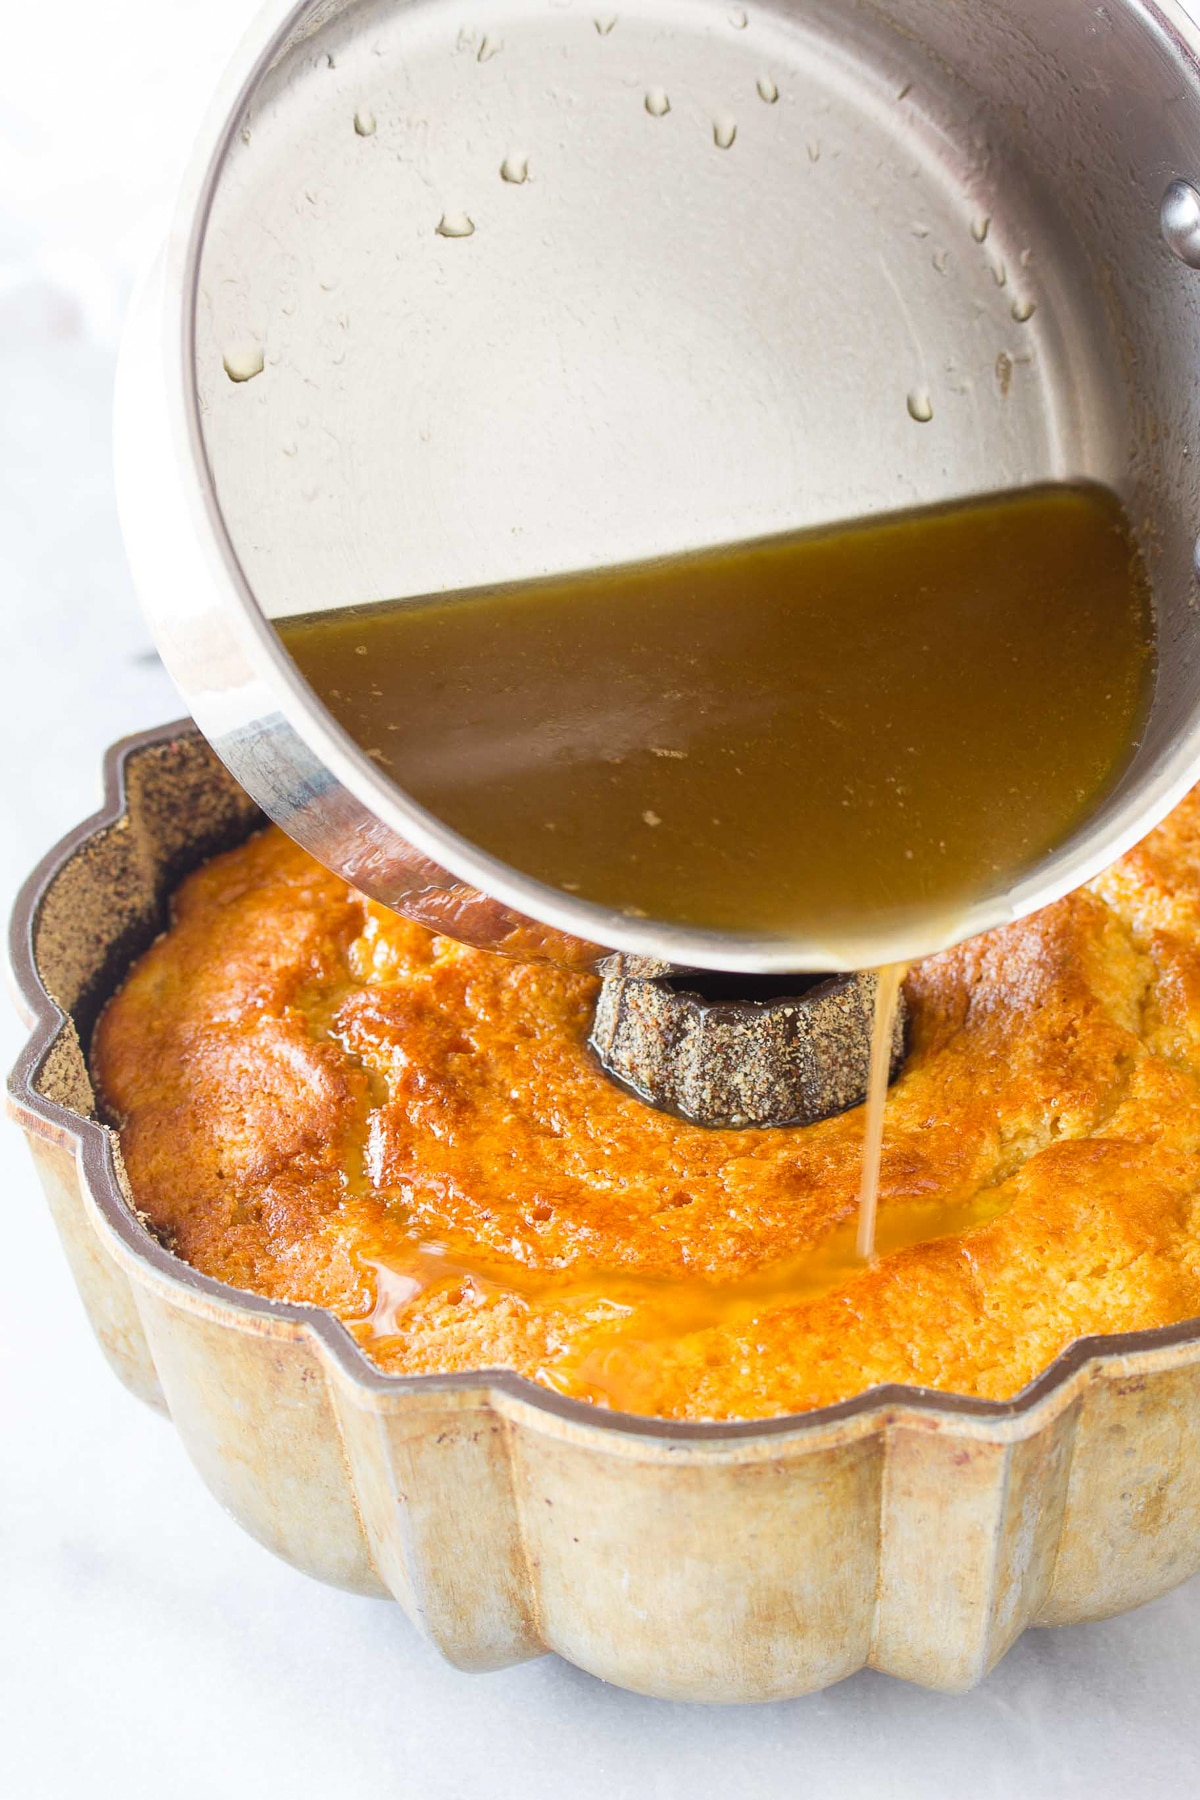 Easy Rum Cake #ASpicyPerspective #bundtcake #spicecake #rum #rumcake #caribbean #holiday #coconut #pineapple